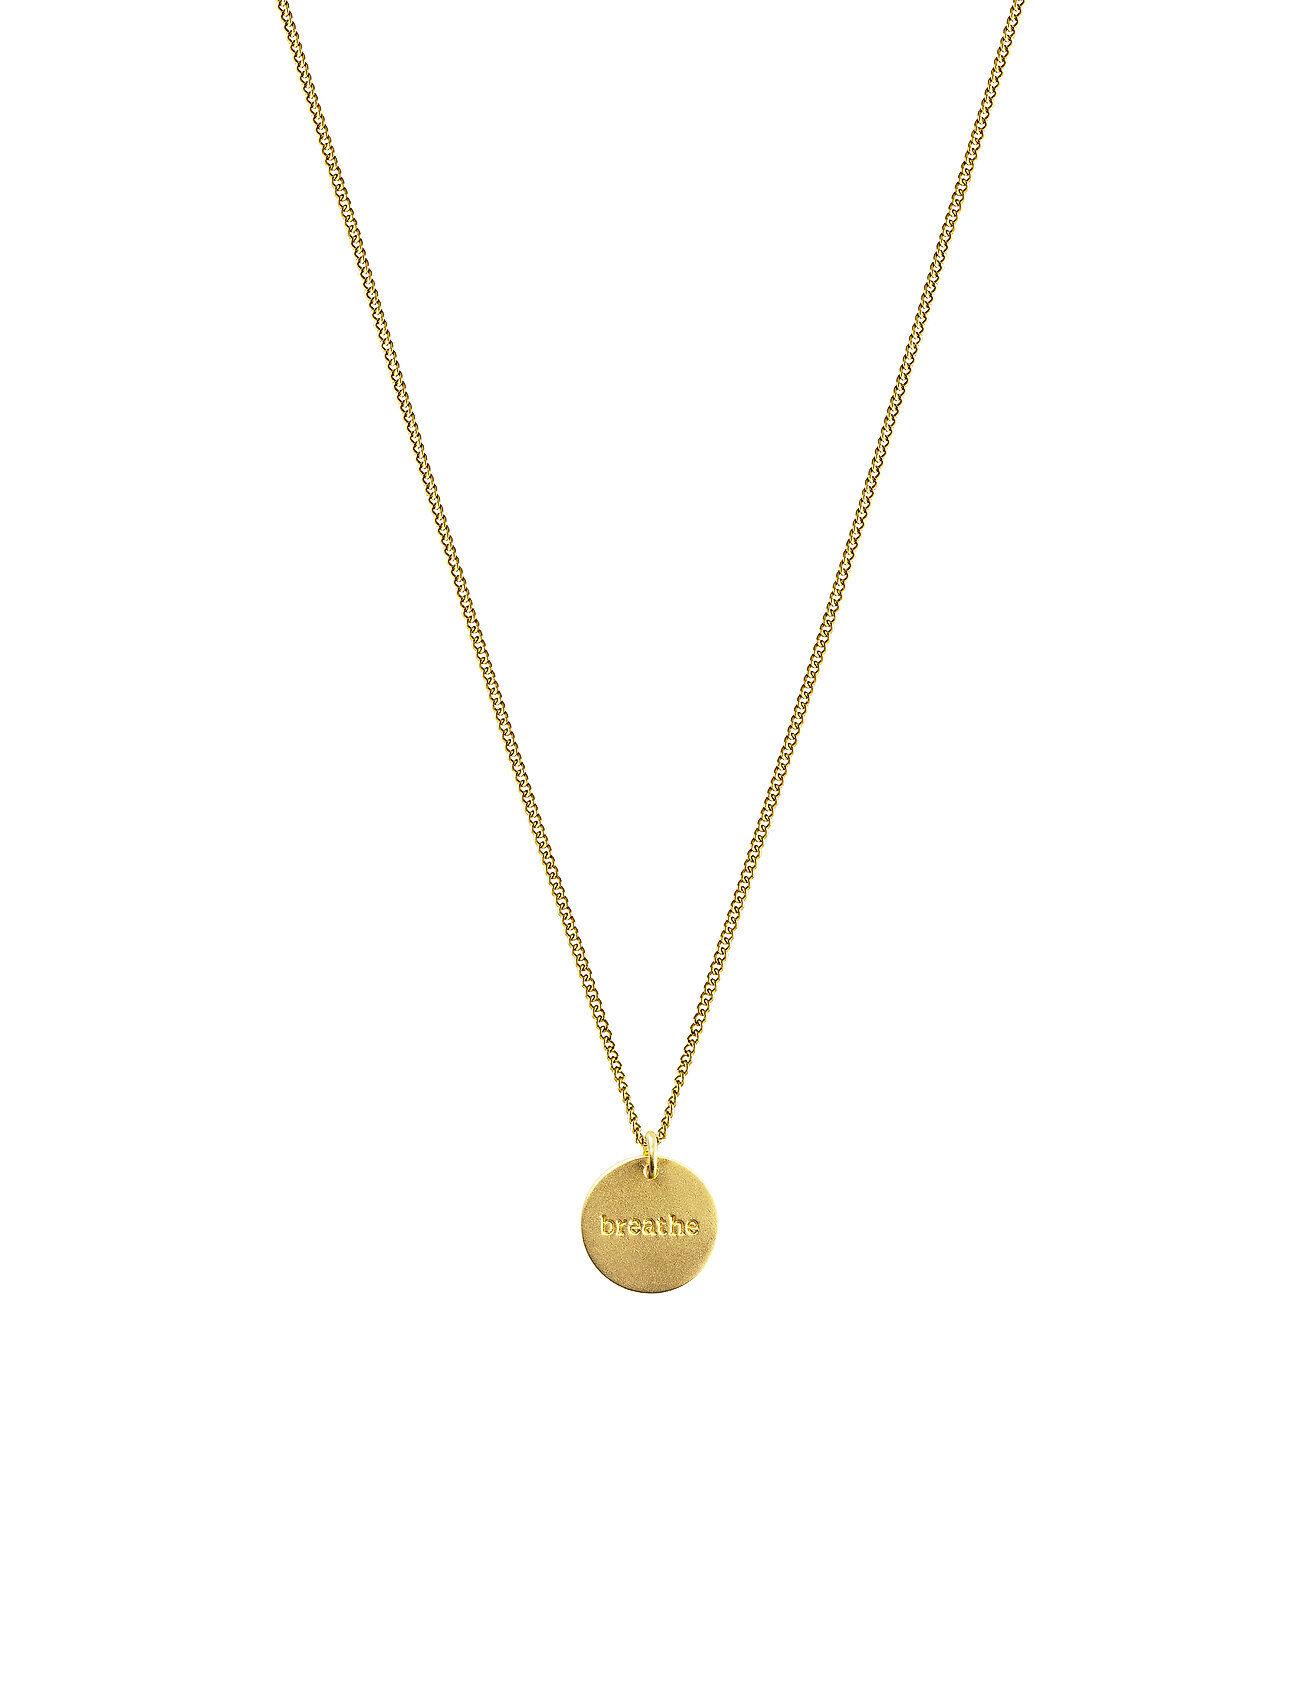 Syster P Minimalistica Breathe Necklace Gold